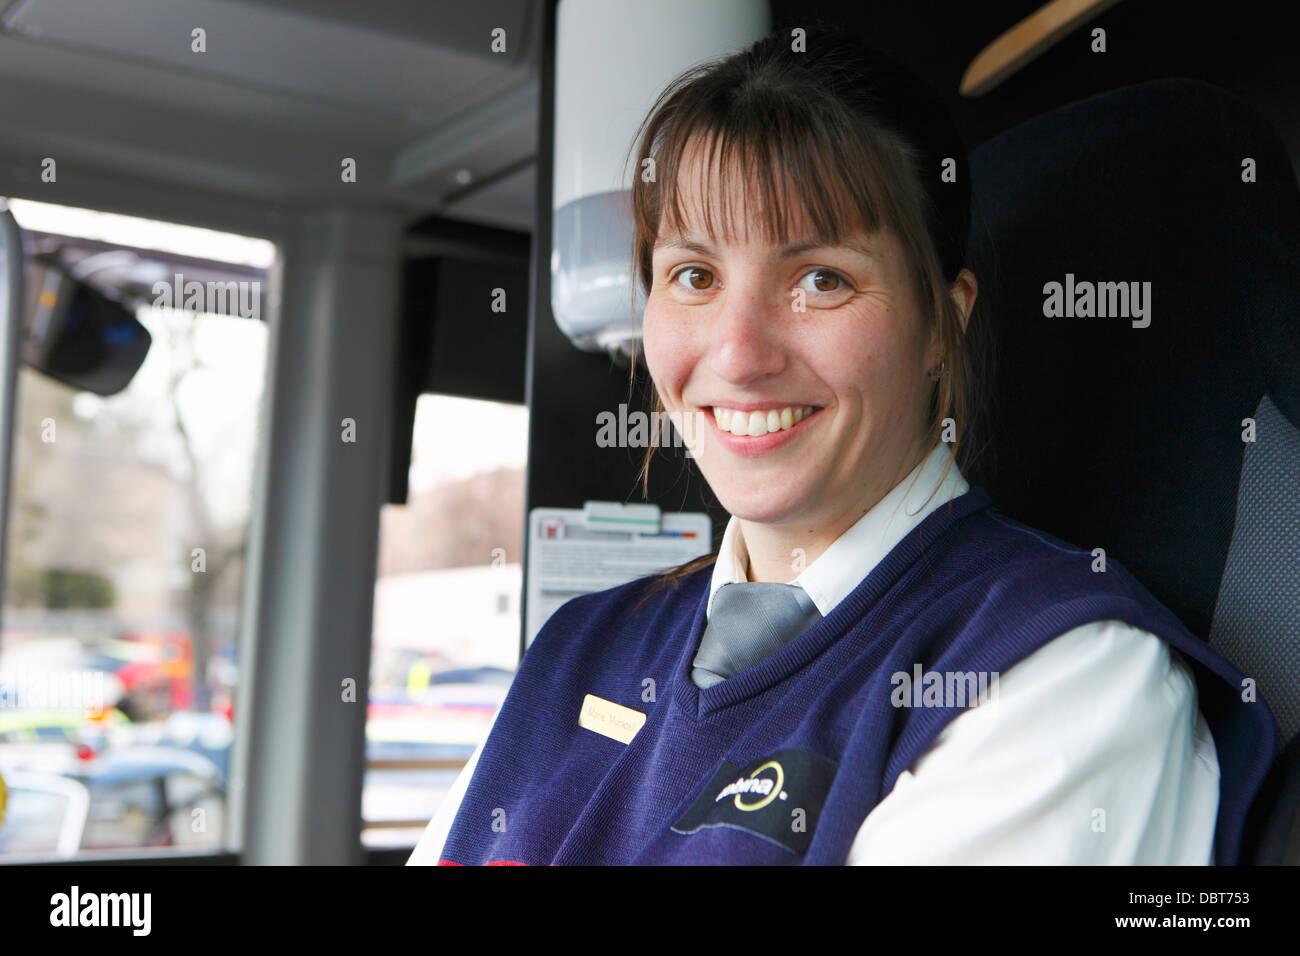 Portrait of female bus driver - Stock Image